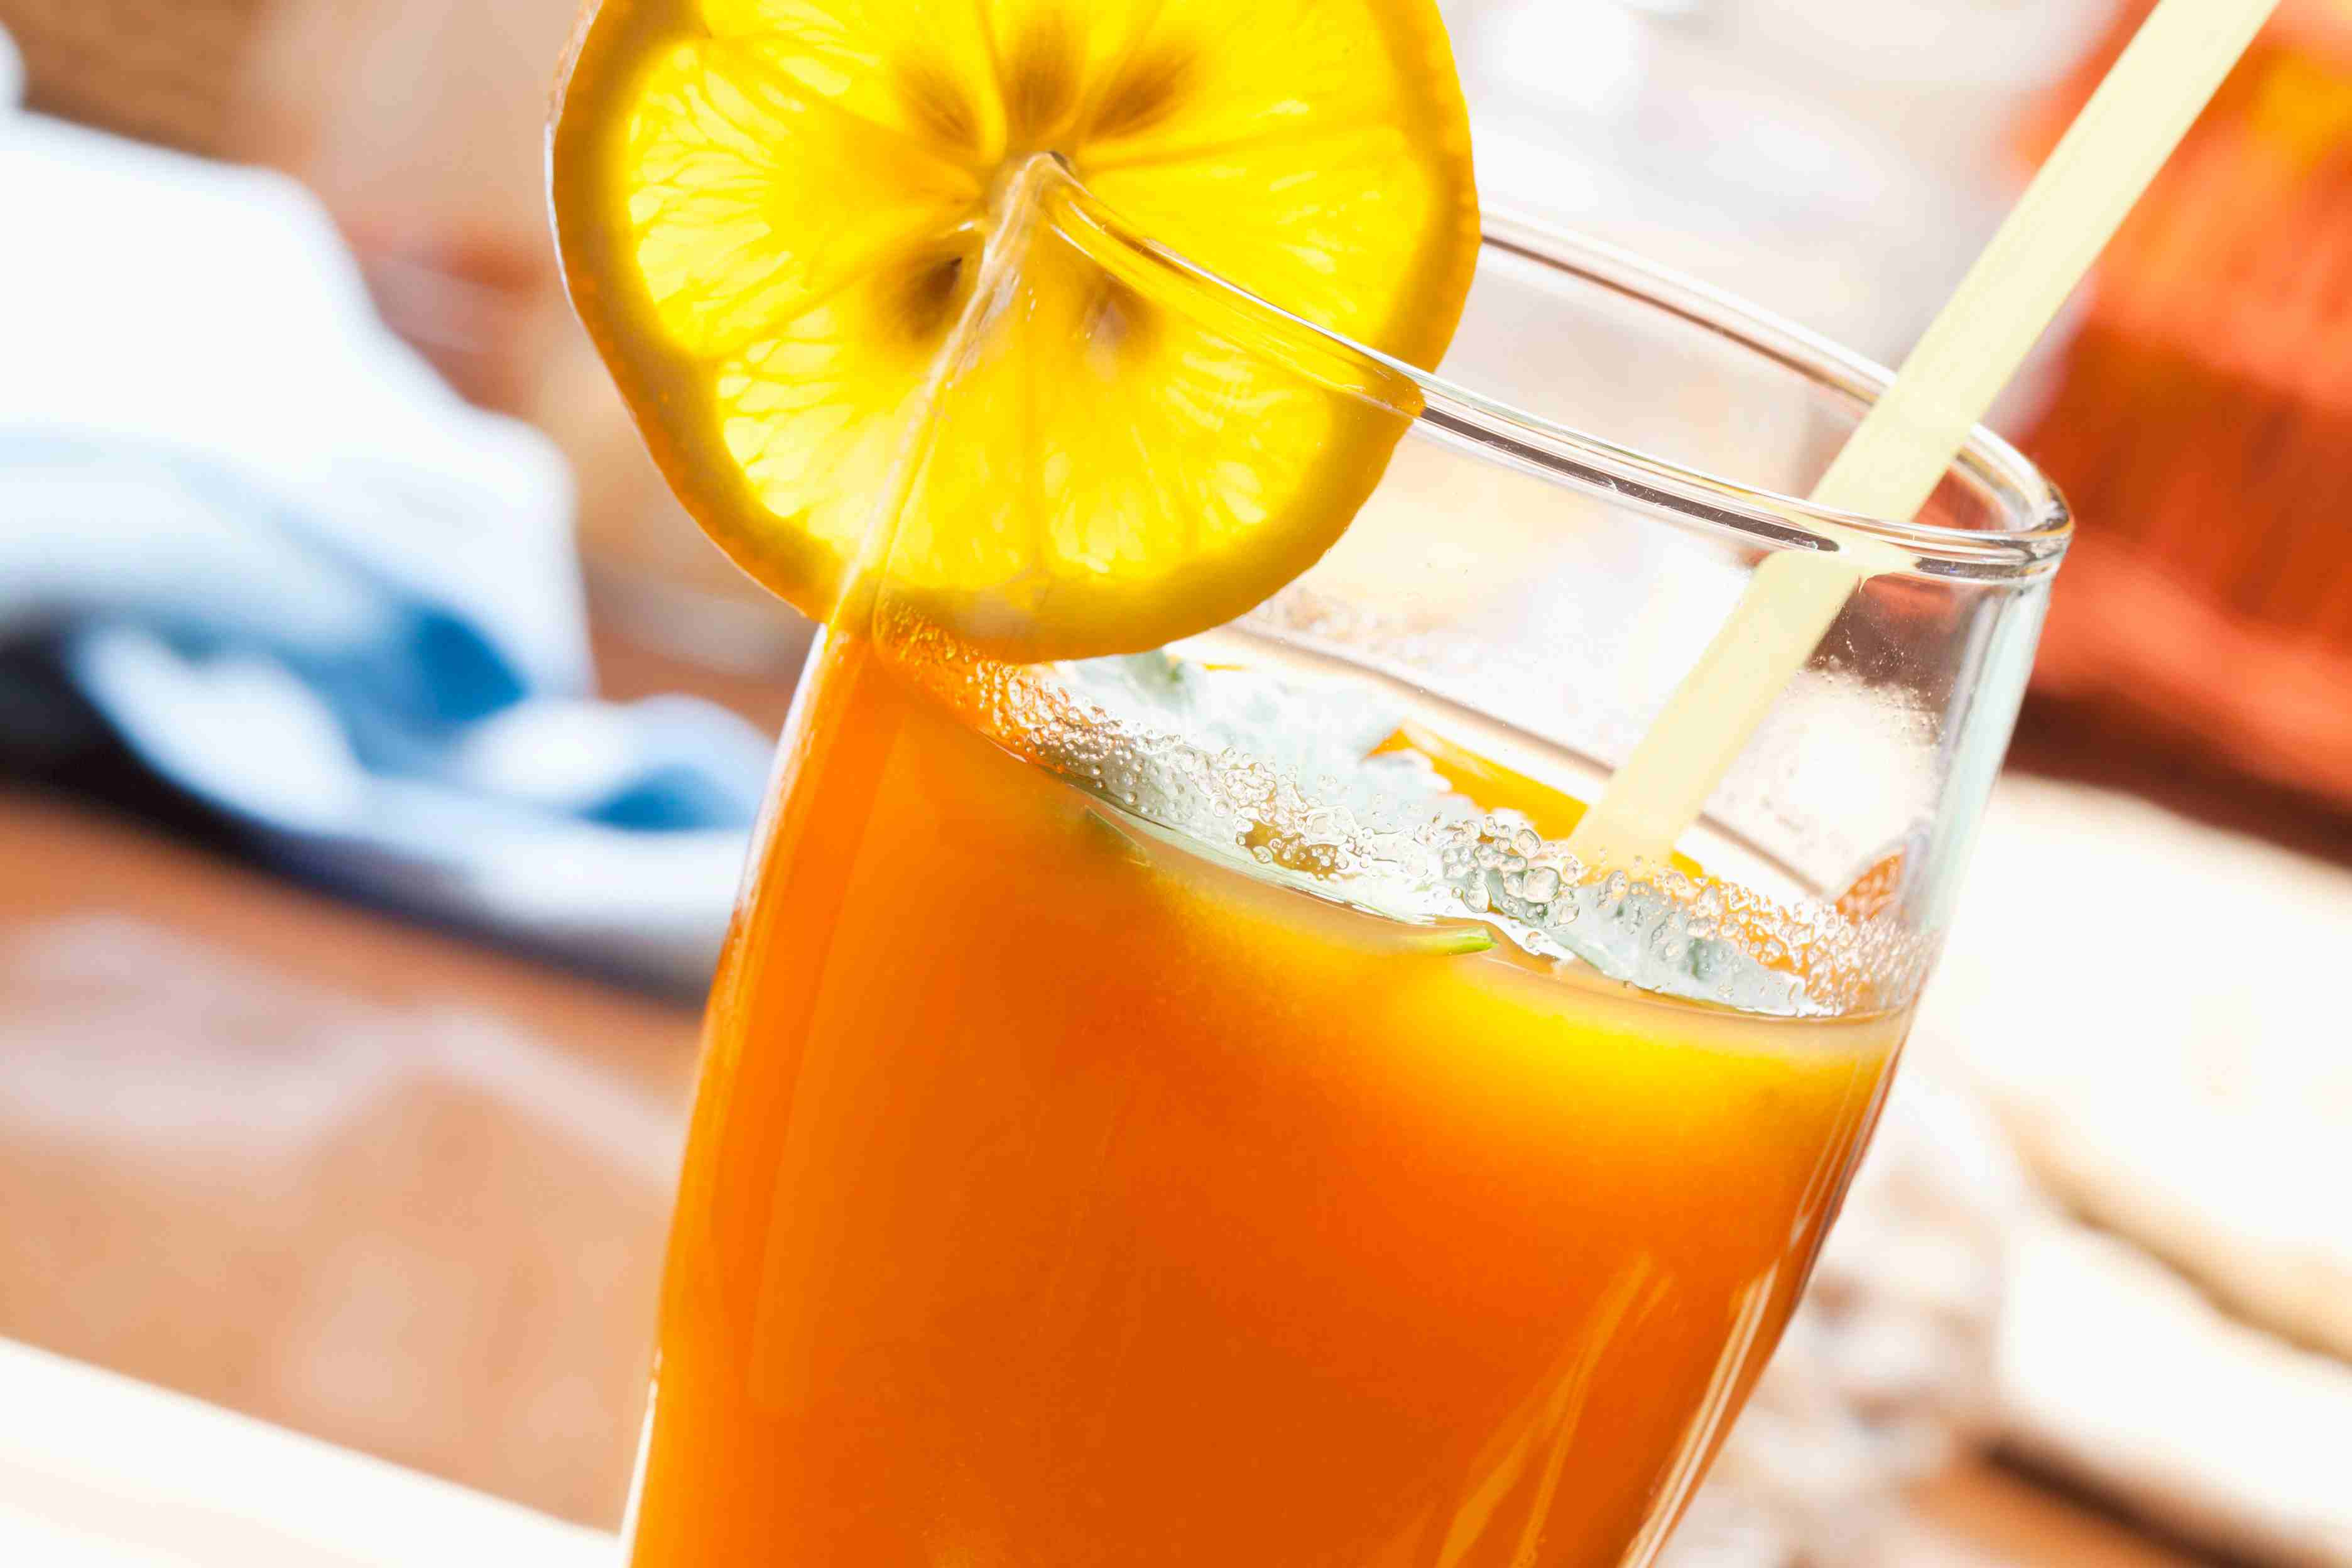 Pumpkin Spice Cocktail with Skyy Vodka